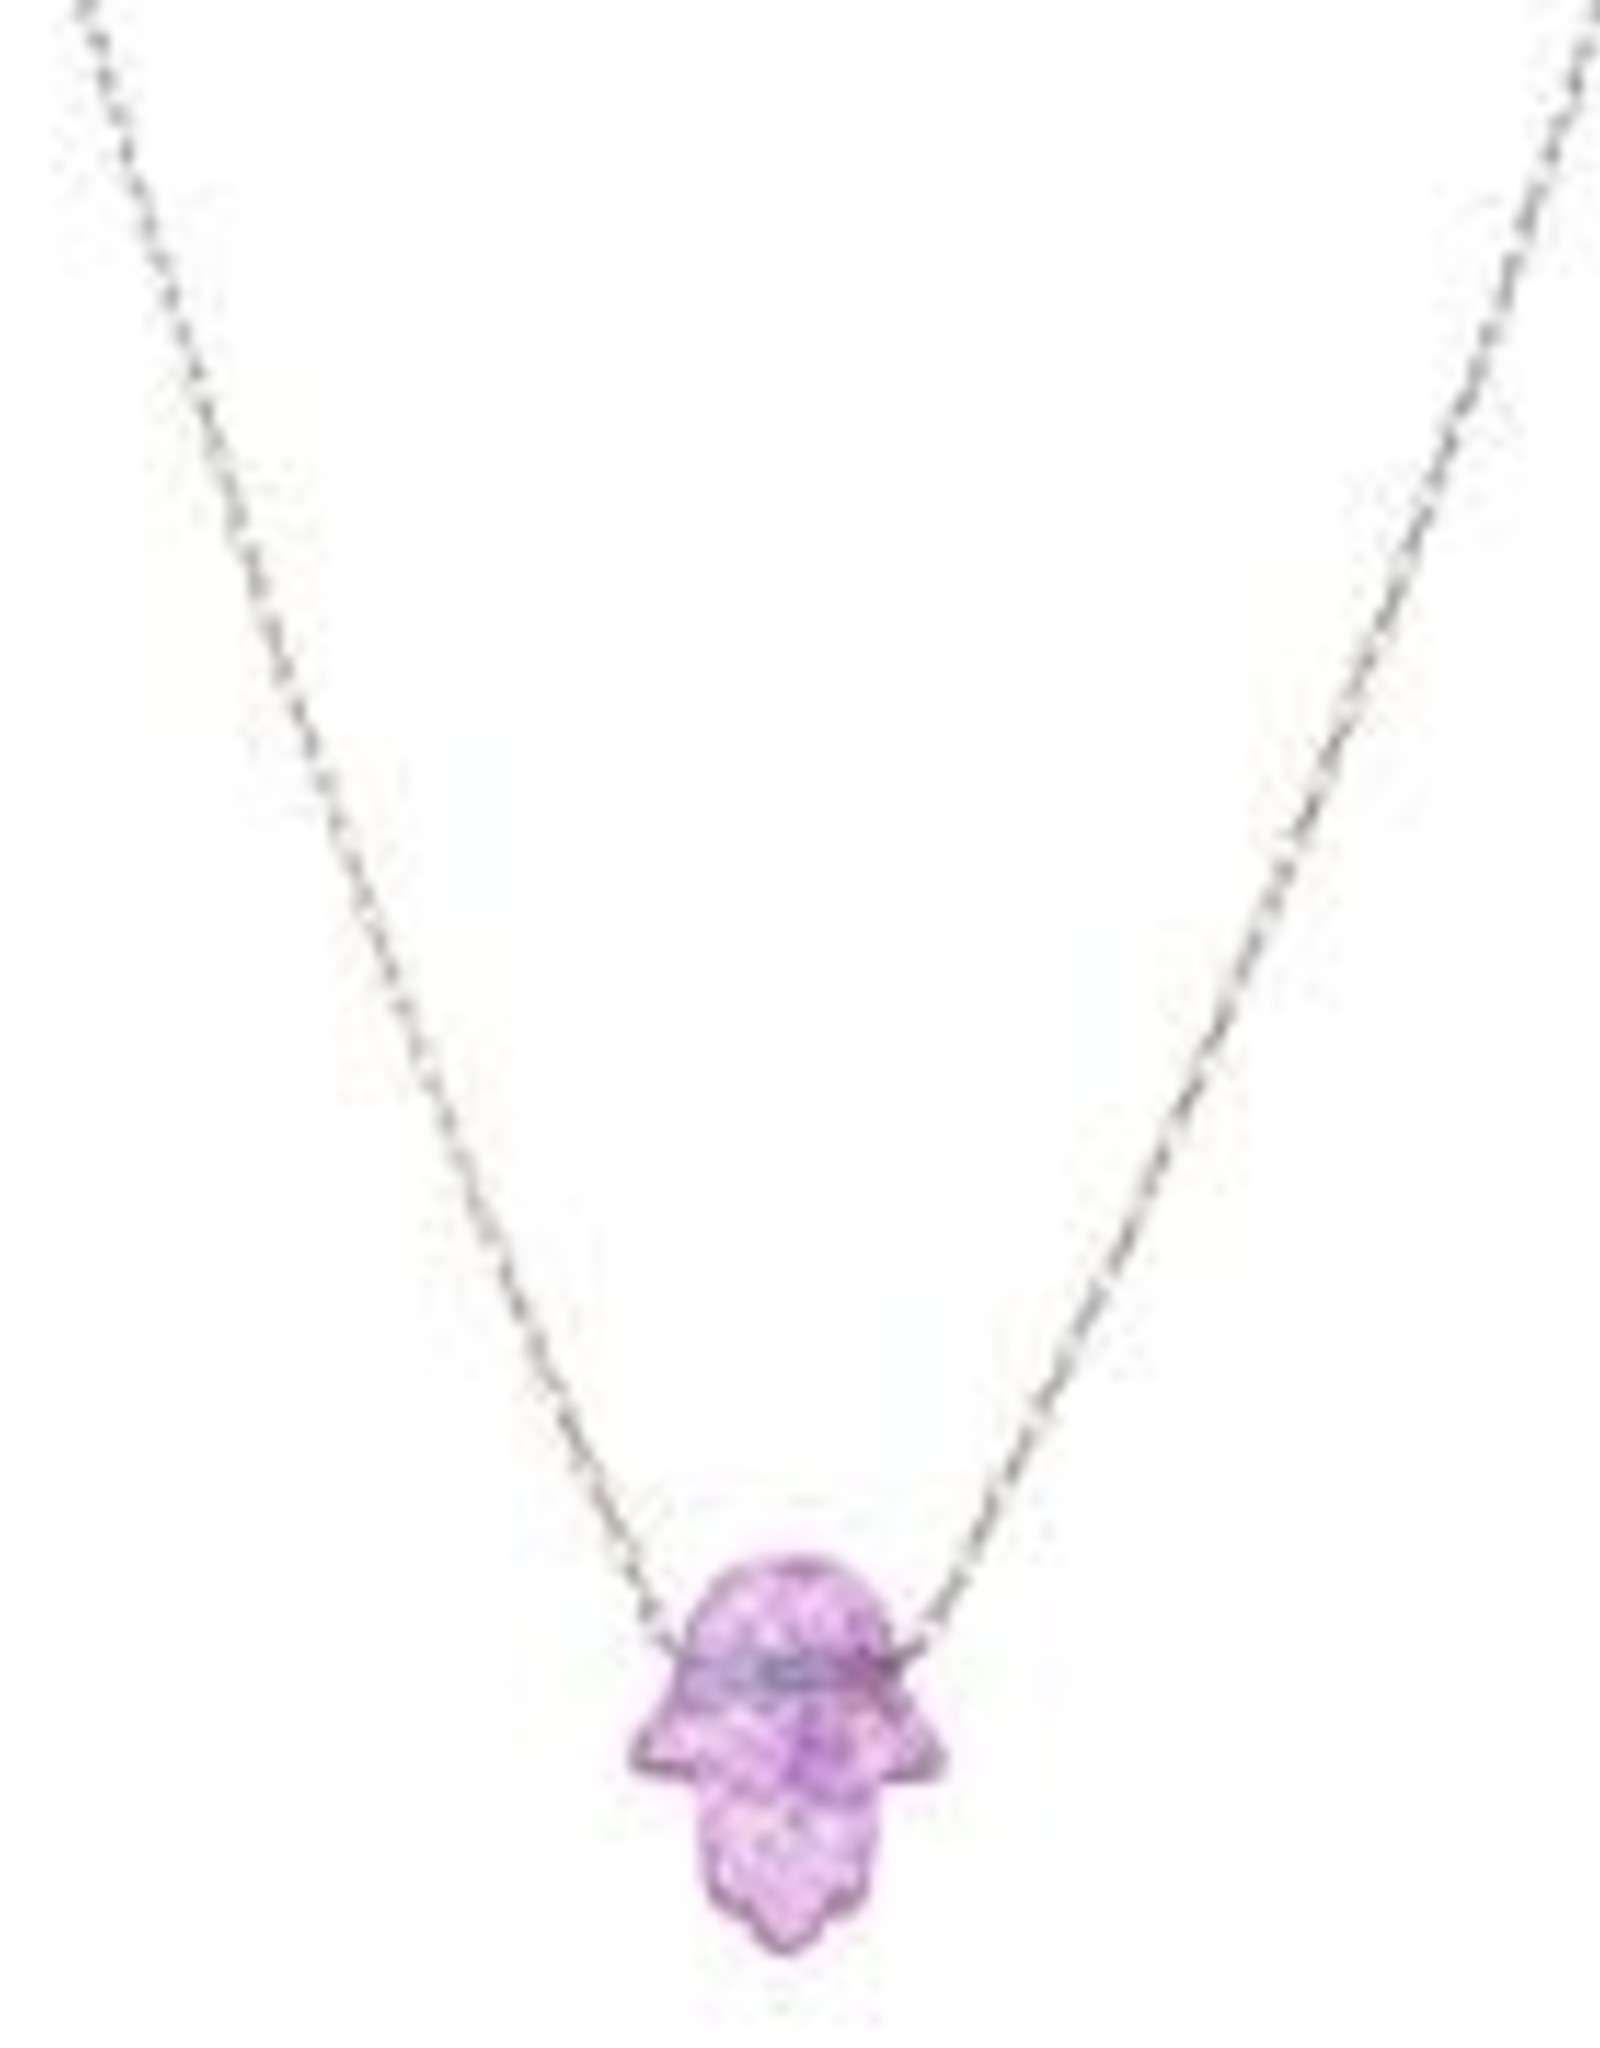 Necklace, Pink Opal Hamsa